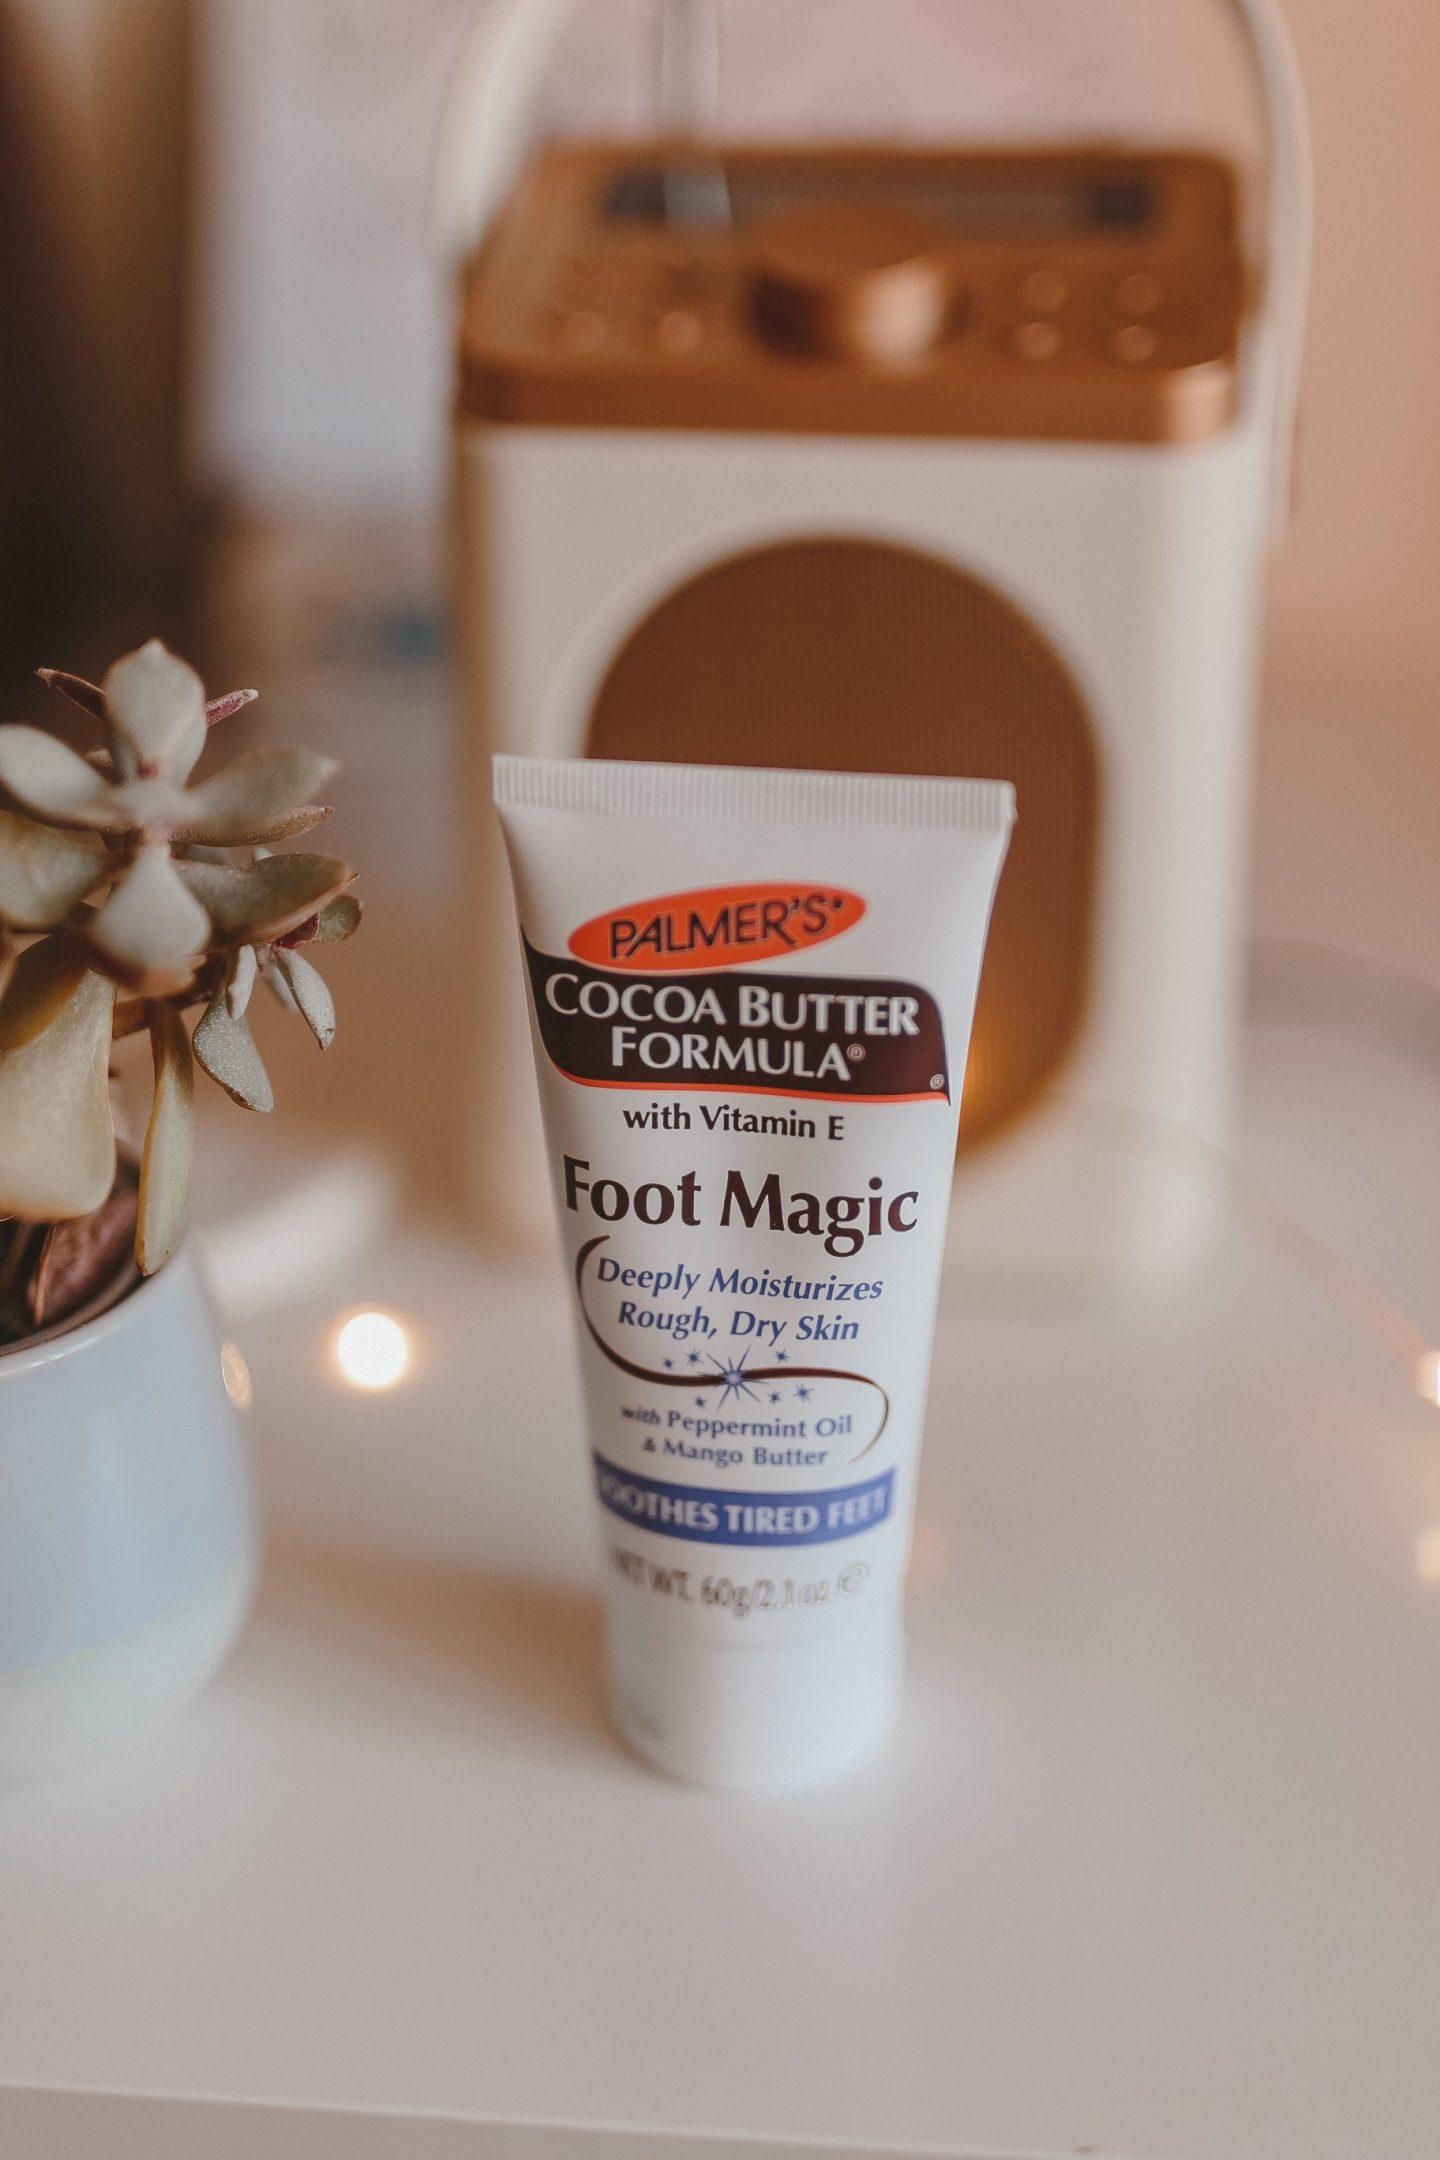 Cheap Foot Cream, Rough foot cream, Palmer's Foot Magic Cream, Review, Best Foot Cream, Beauty Blogs, Beauty Bloggers, Beauty Bloggers UK, British blogs,